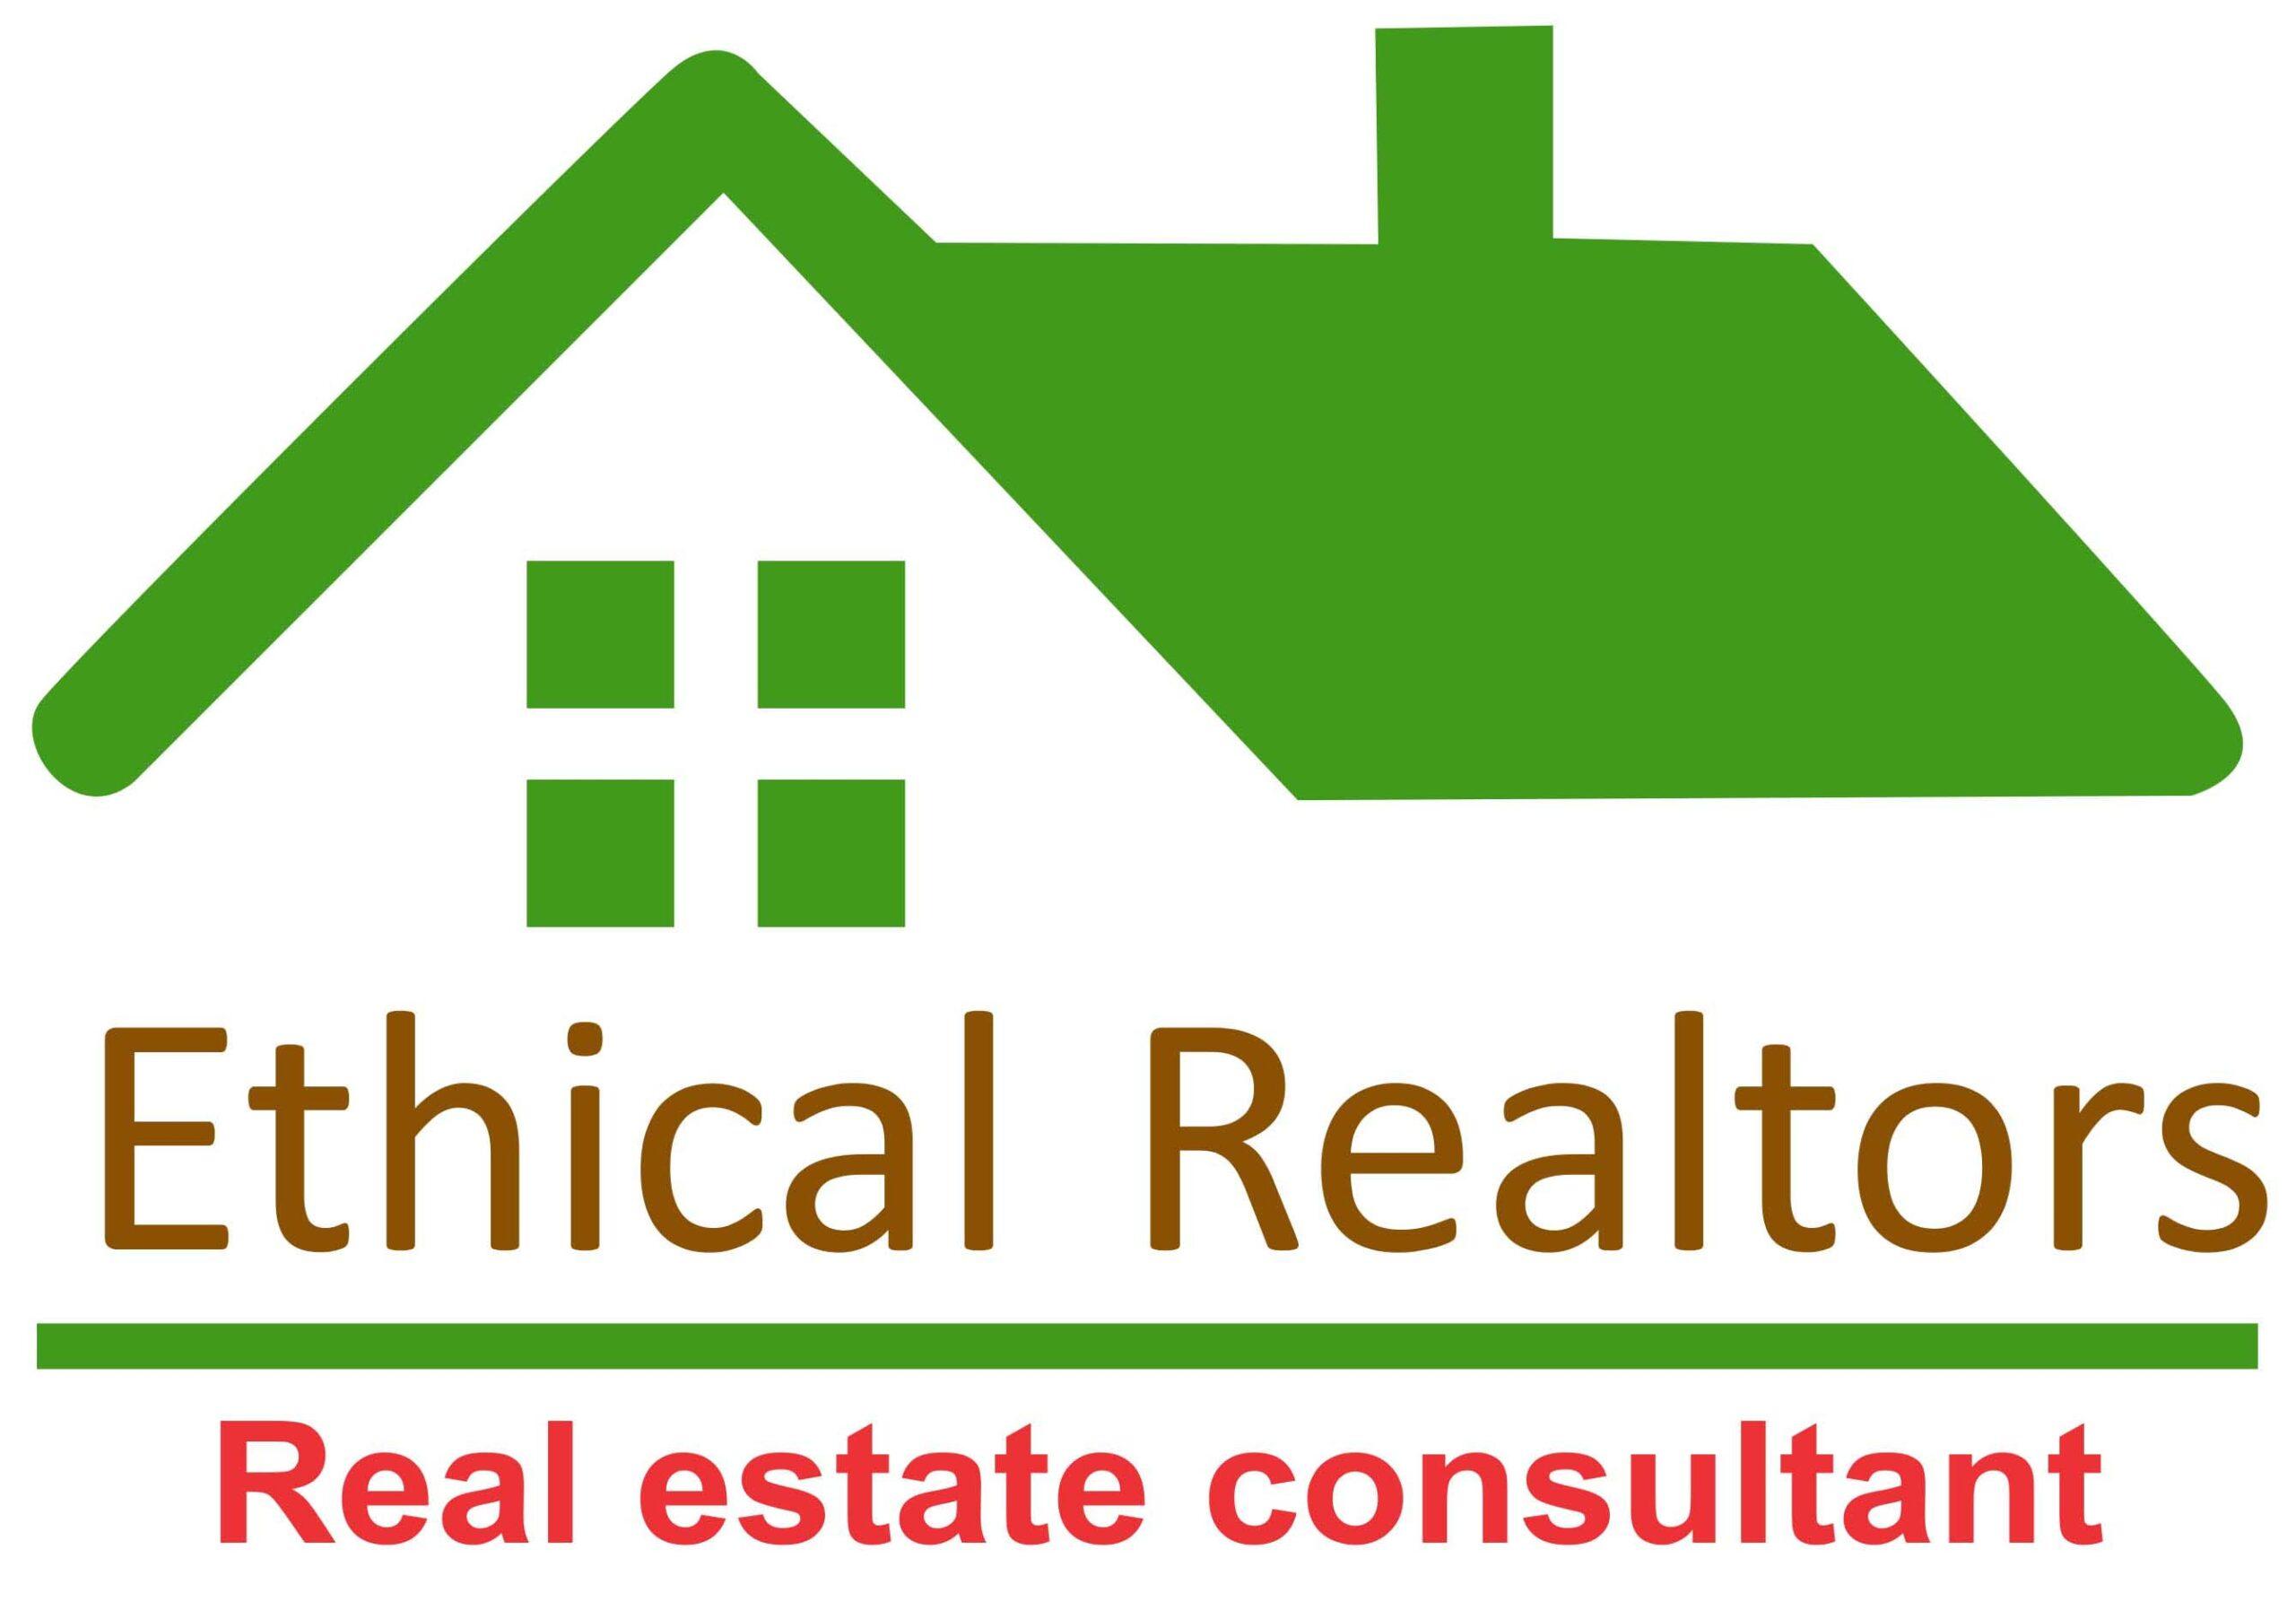 Ethical Realtors